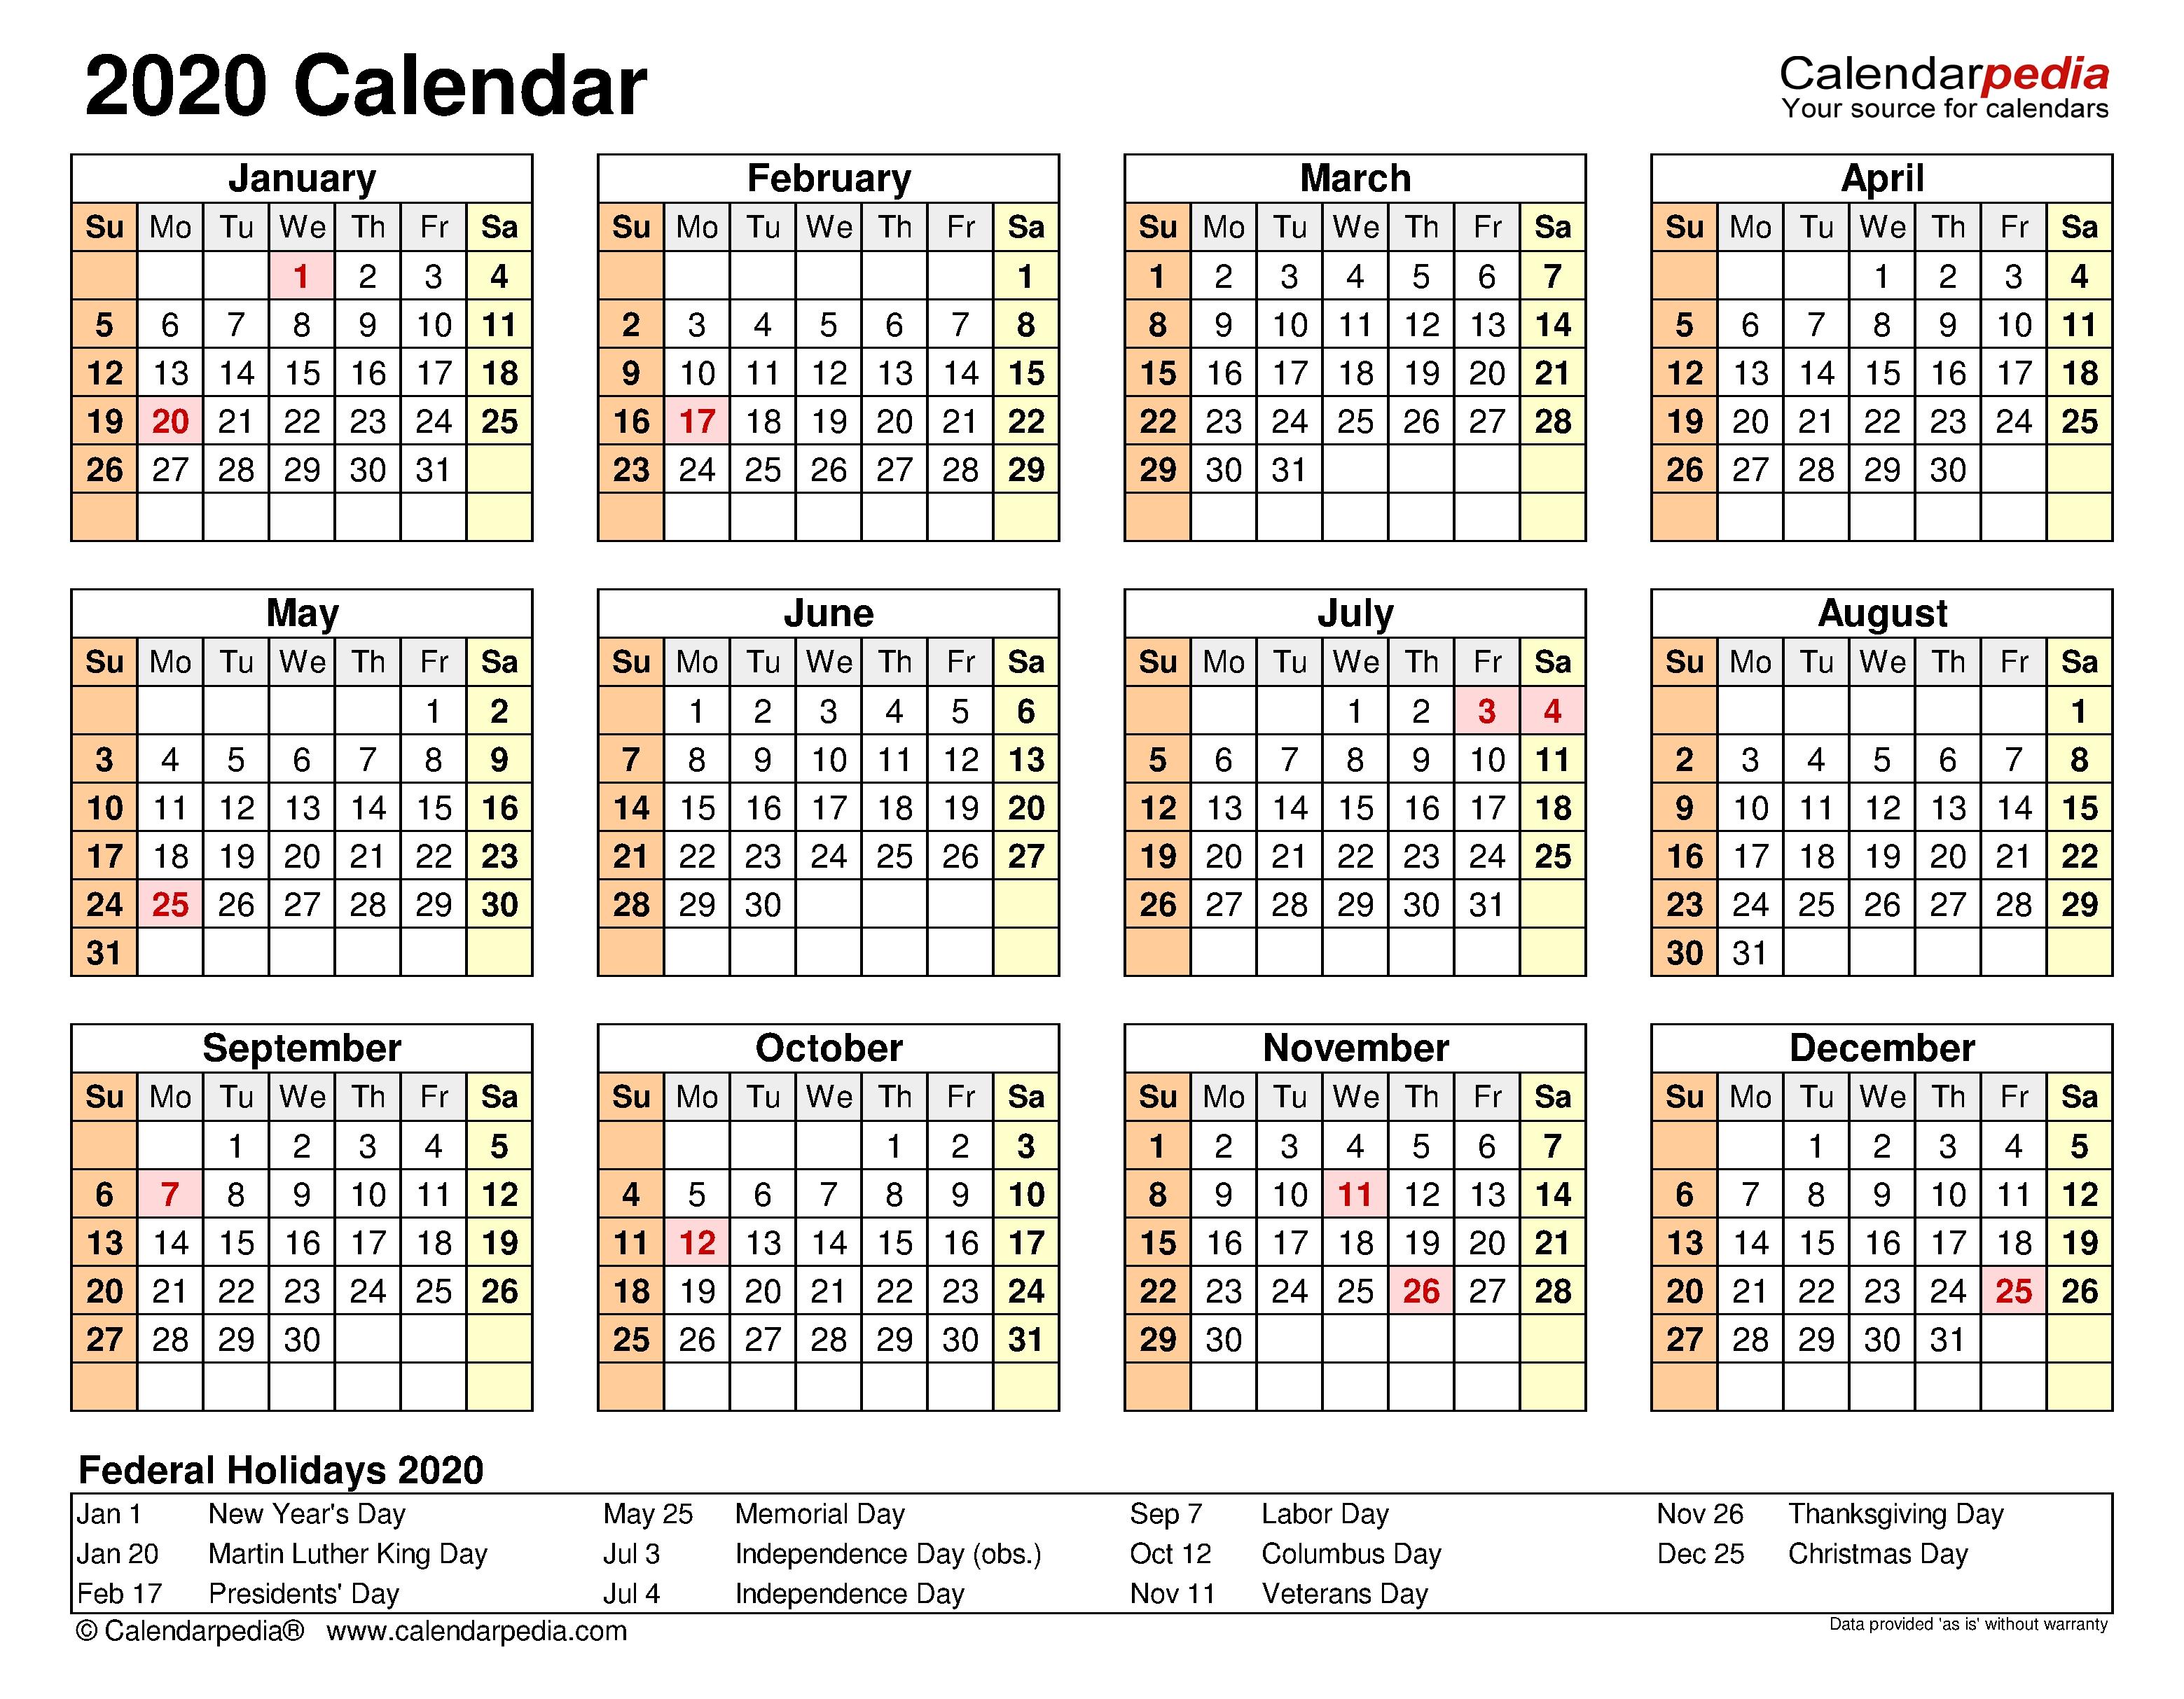 2020 Calendar - Free Printable Microsoft Word Templates  2020 Calendar Printable Calendarpedia